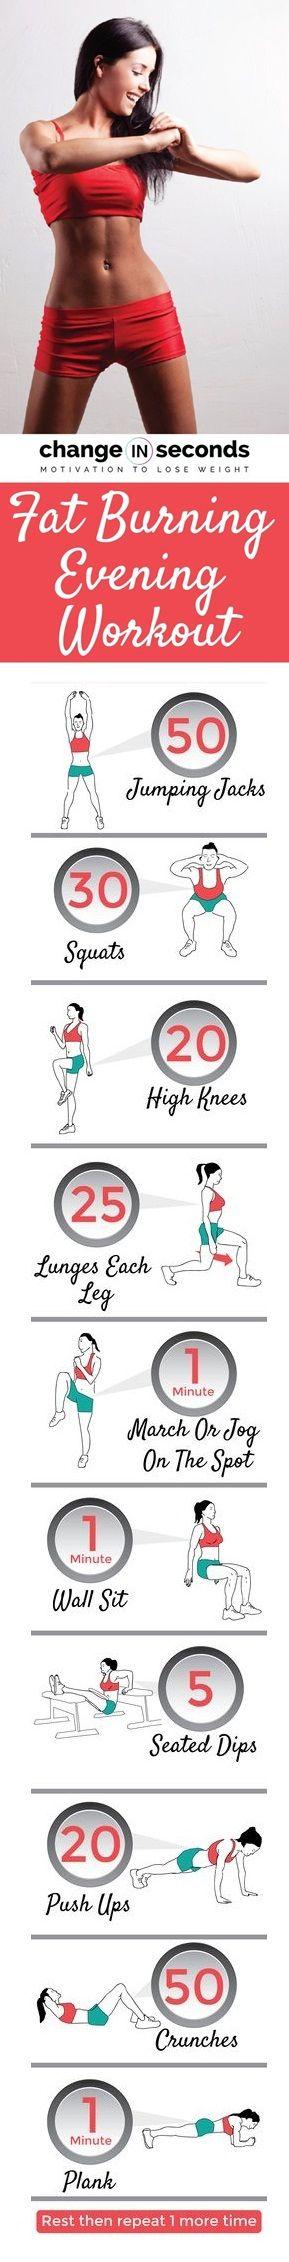 Fat Burning Evening Workout (Download PDF)